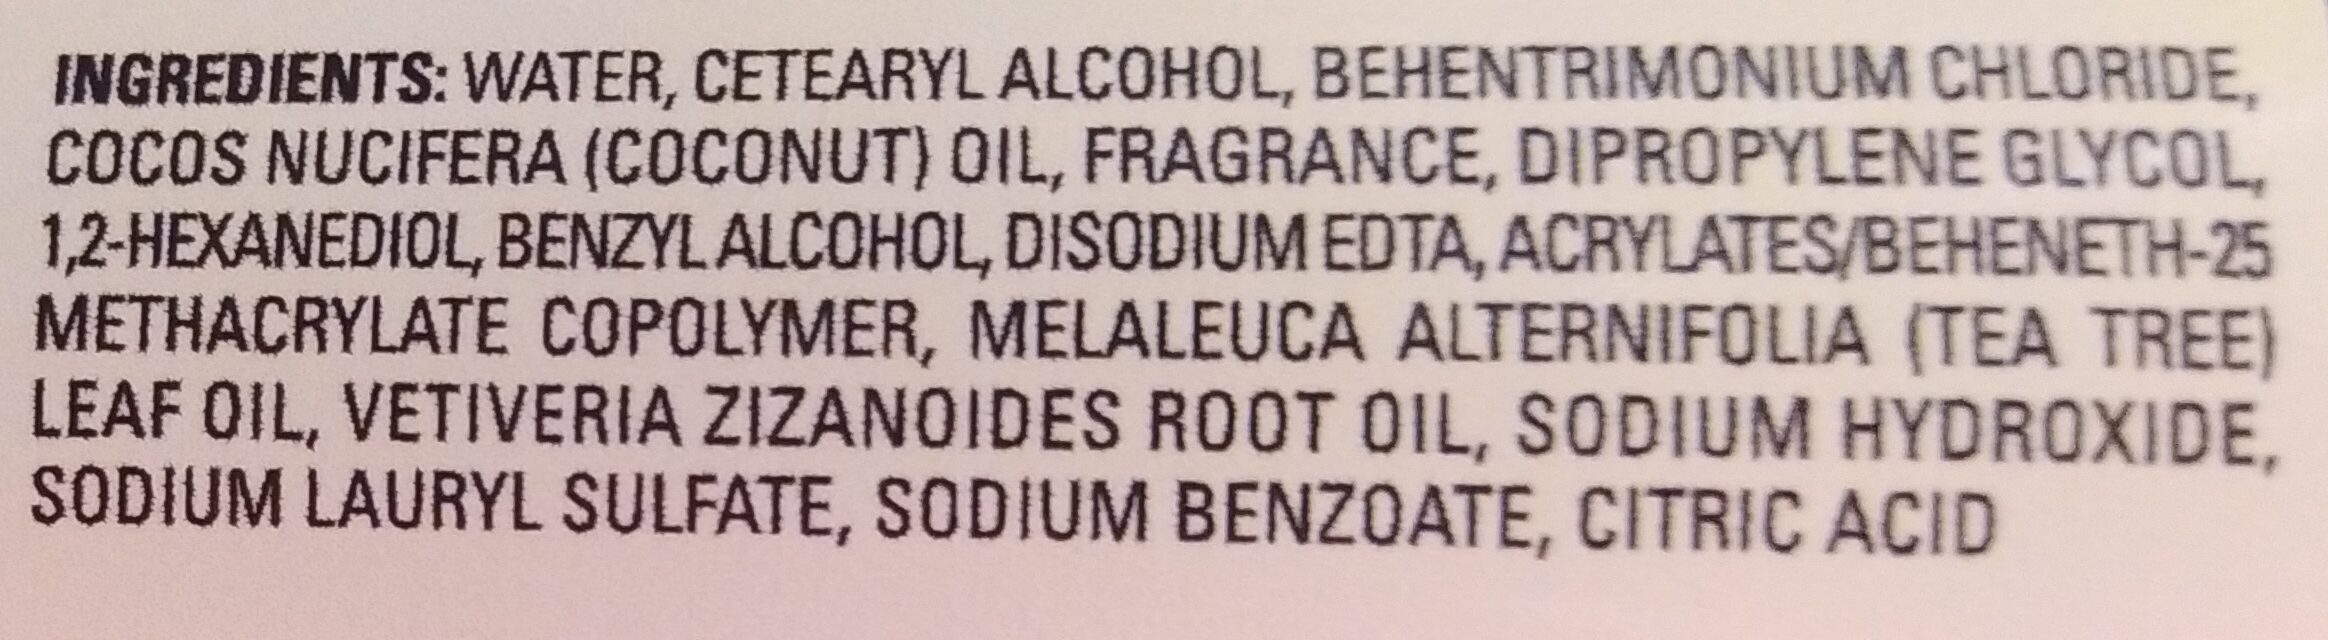 Tea Tree Oil & Vetiver Conditioner - Ingredients - en